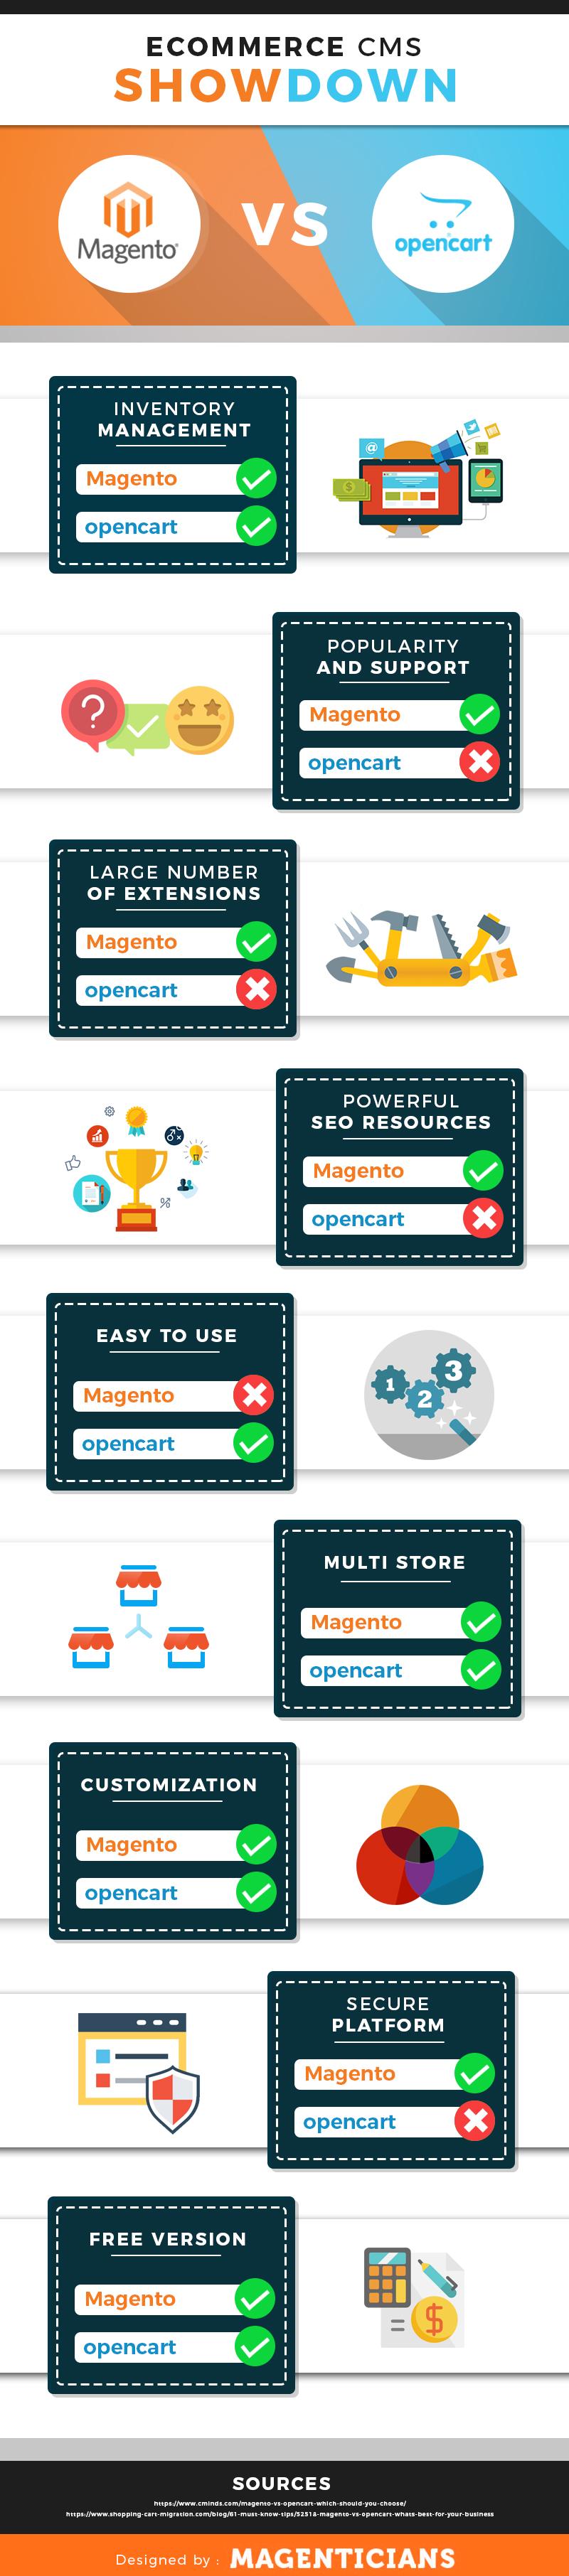 magento vs opencart infographic